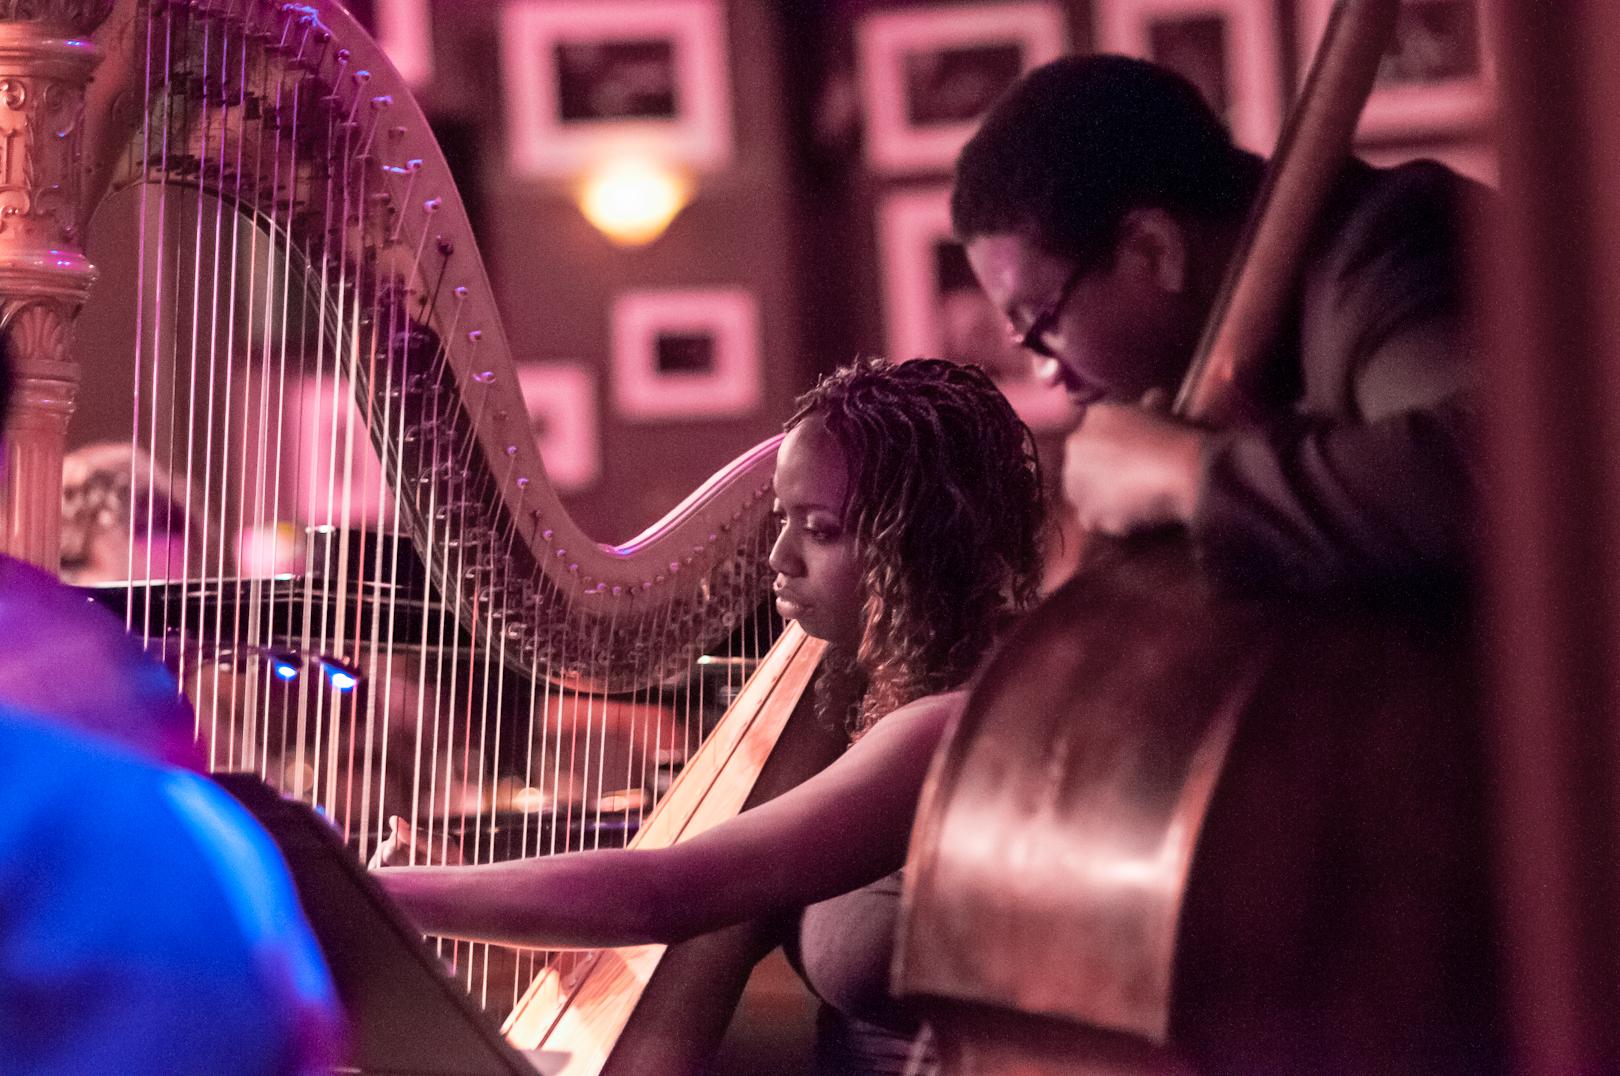 Brandee Younger and Dezron Douglas with the Ravi Coltrane Quartet at Birdland